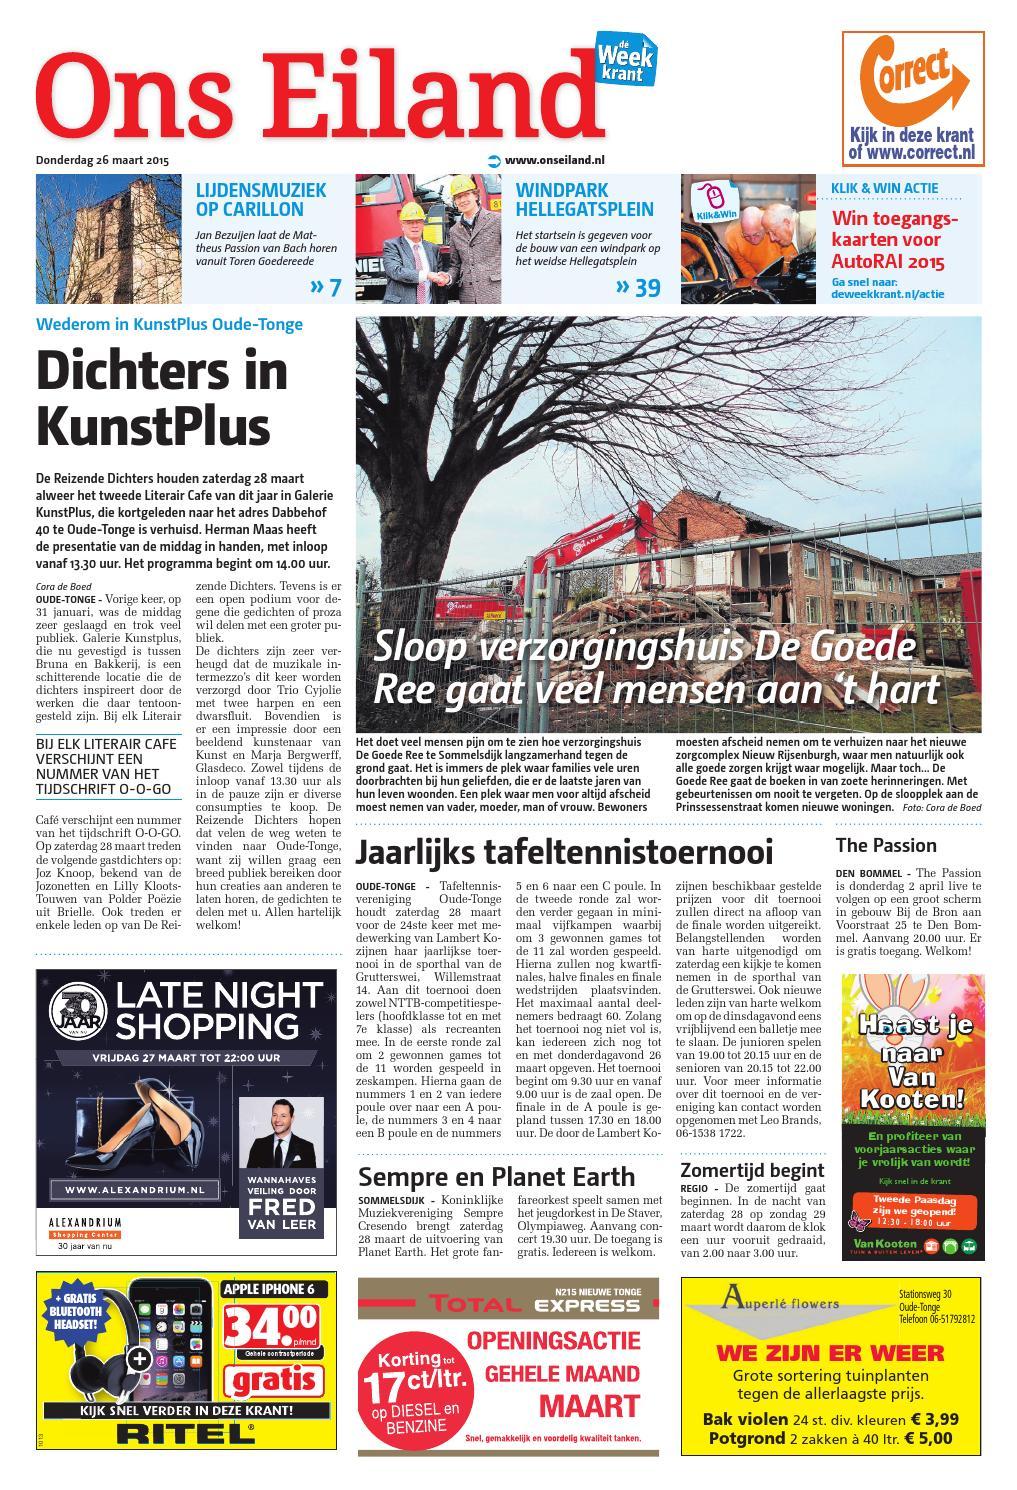 Tuinkast Bayern Gratis Bezorgd Nederland.Ons Eiland Goeree Overflakk Week13 By Wegener Issuu